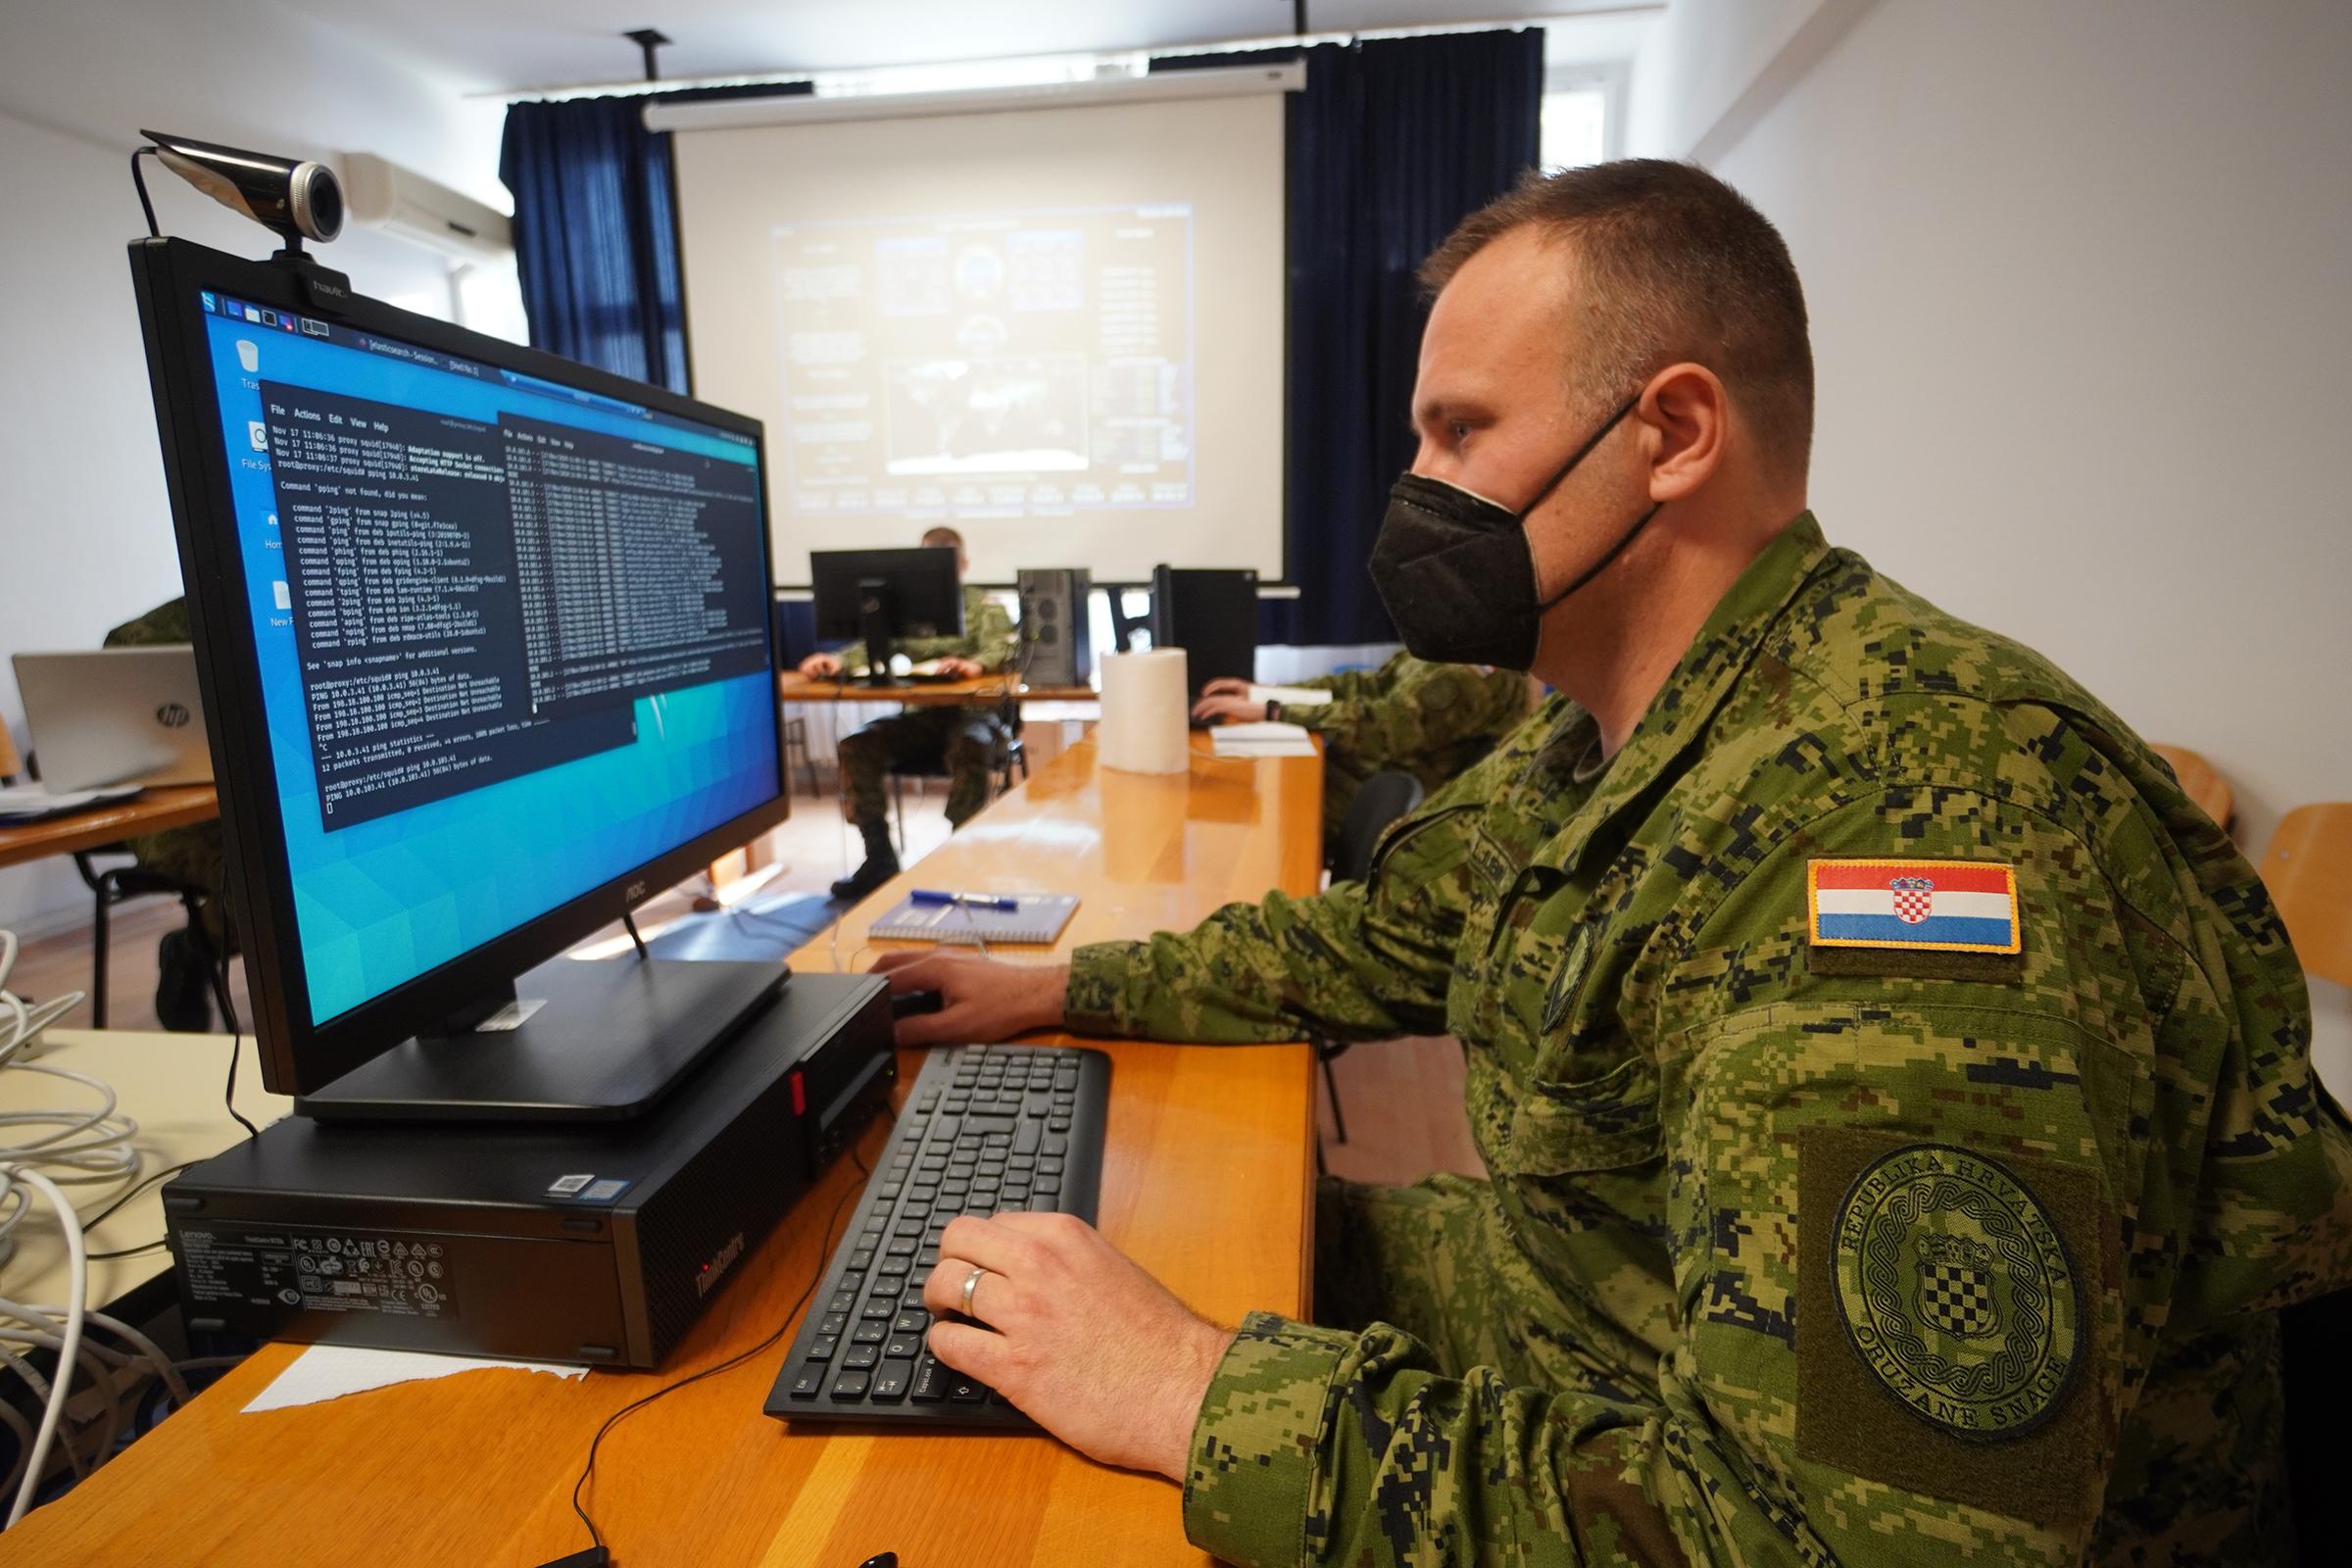 Provedena NATO vježba kibernetičke obrane Cyber Coalition 2020.